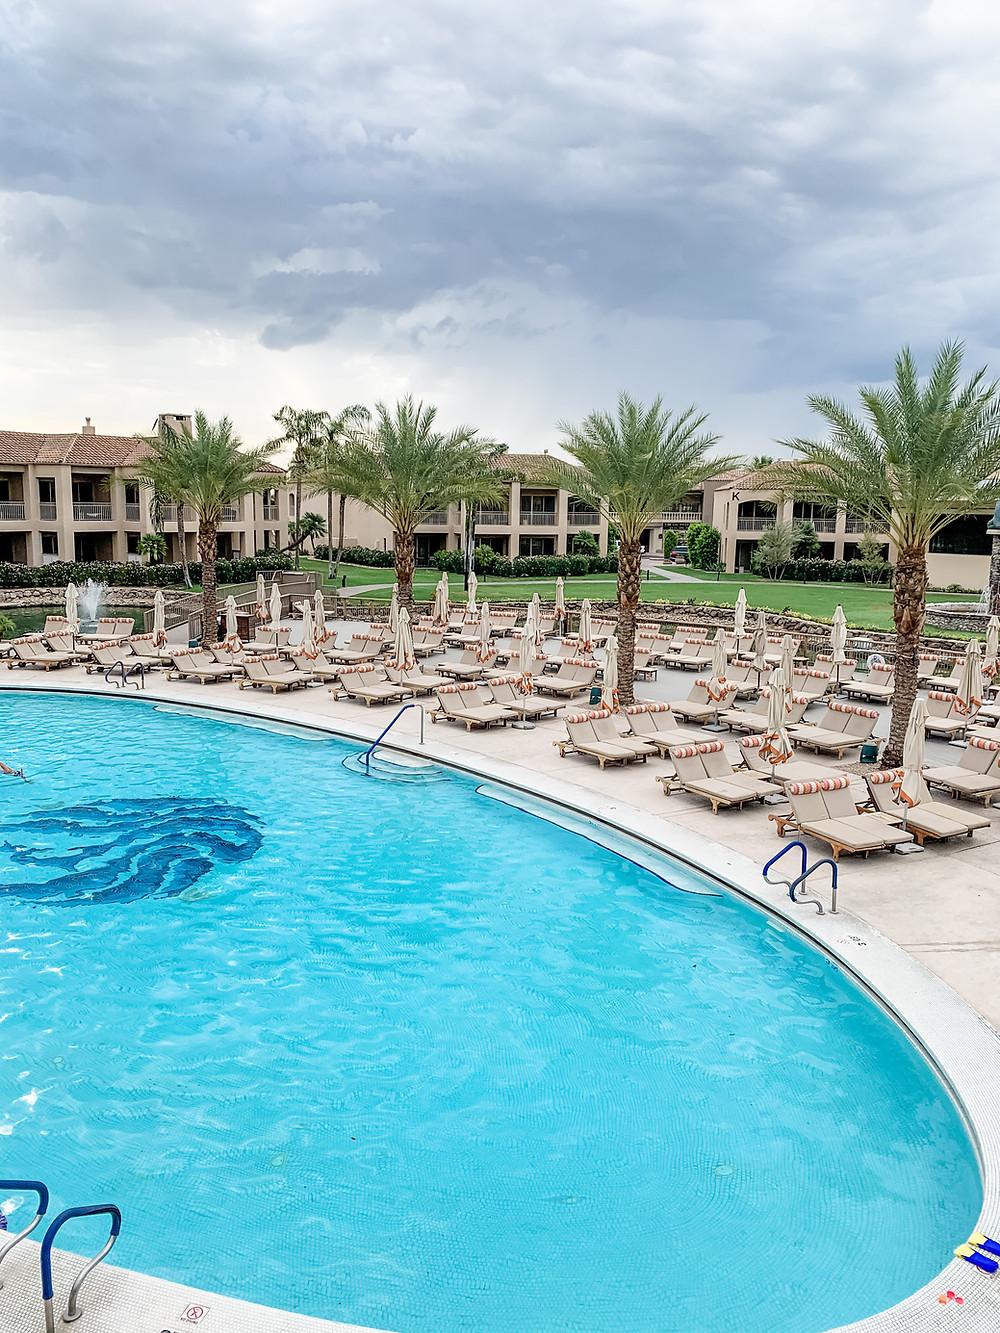 House of Rad Review of The Phoenician Resort Scottsdale Arizona Pool